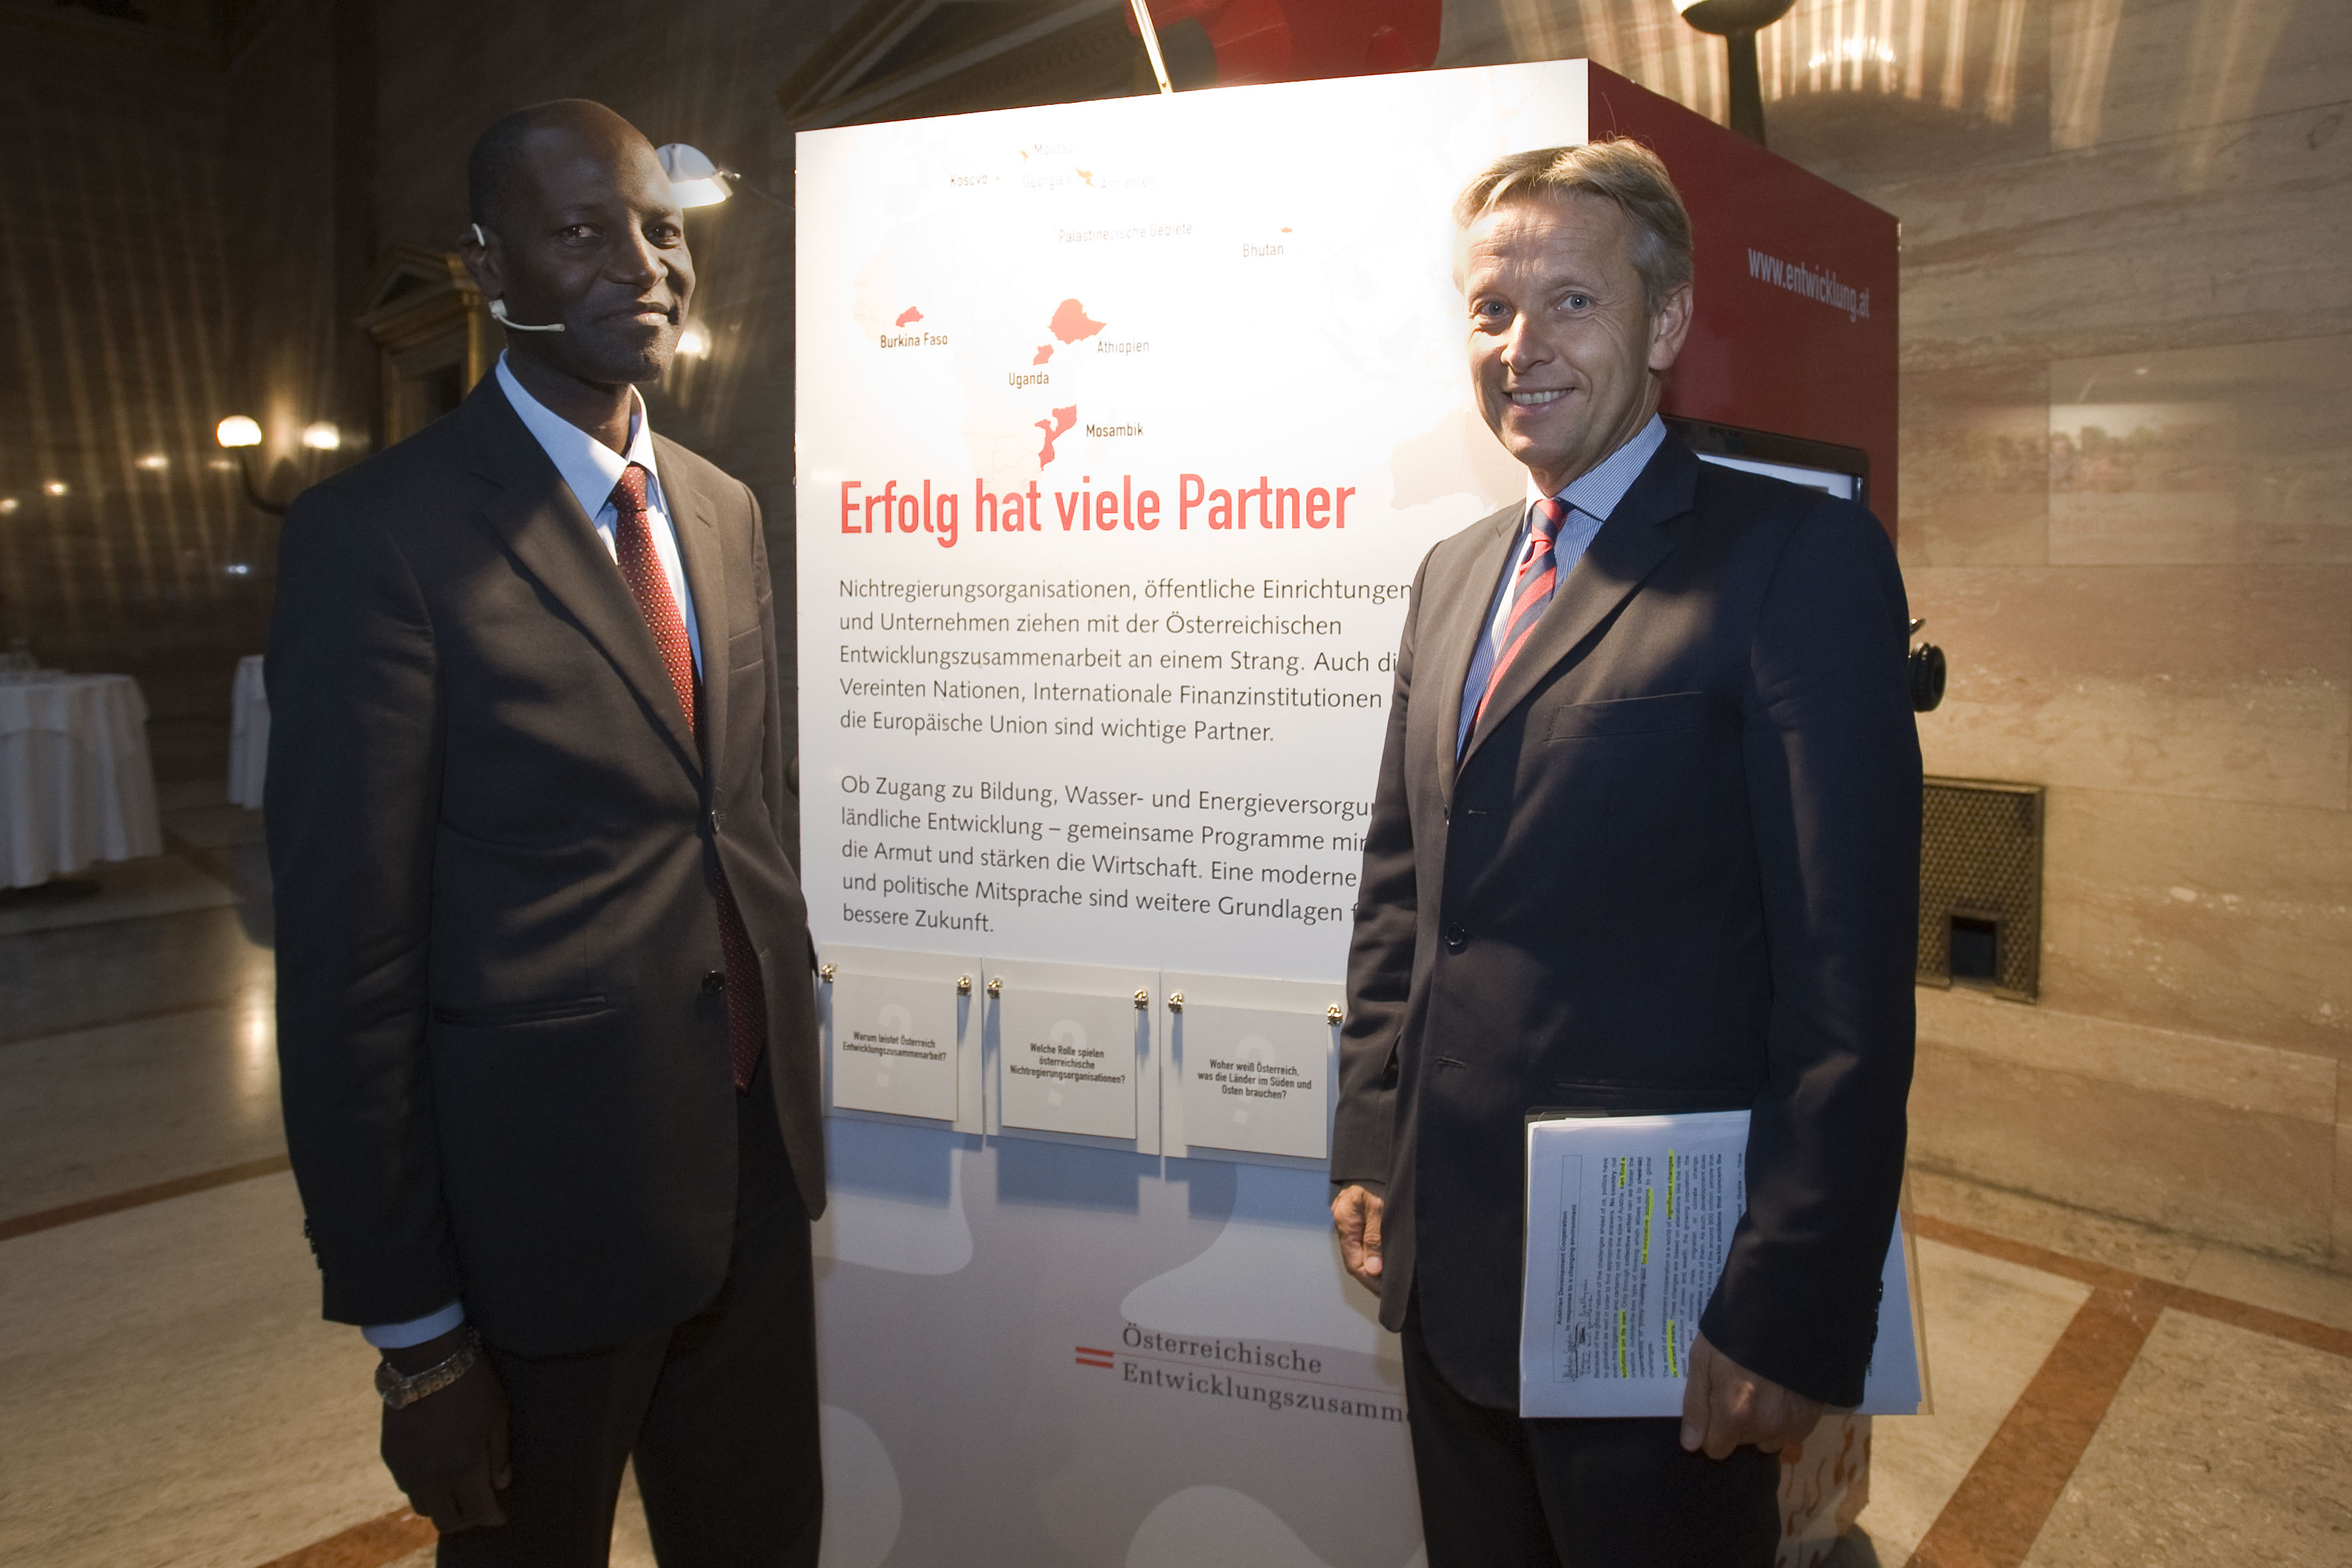 (c) BMEIA STS Lopatka mit Vize Außenminister Mozambik Banze